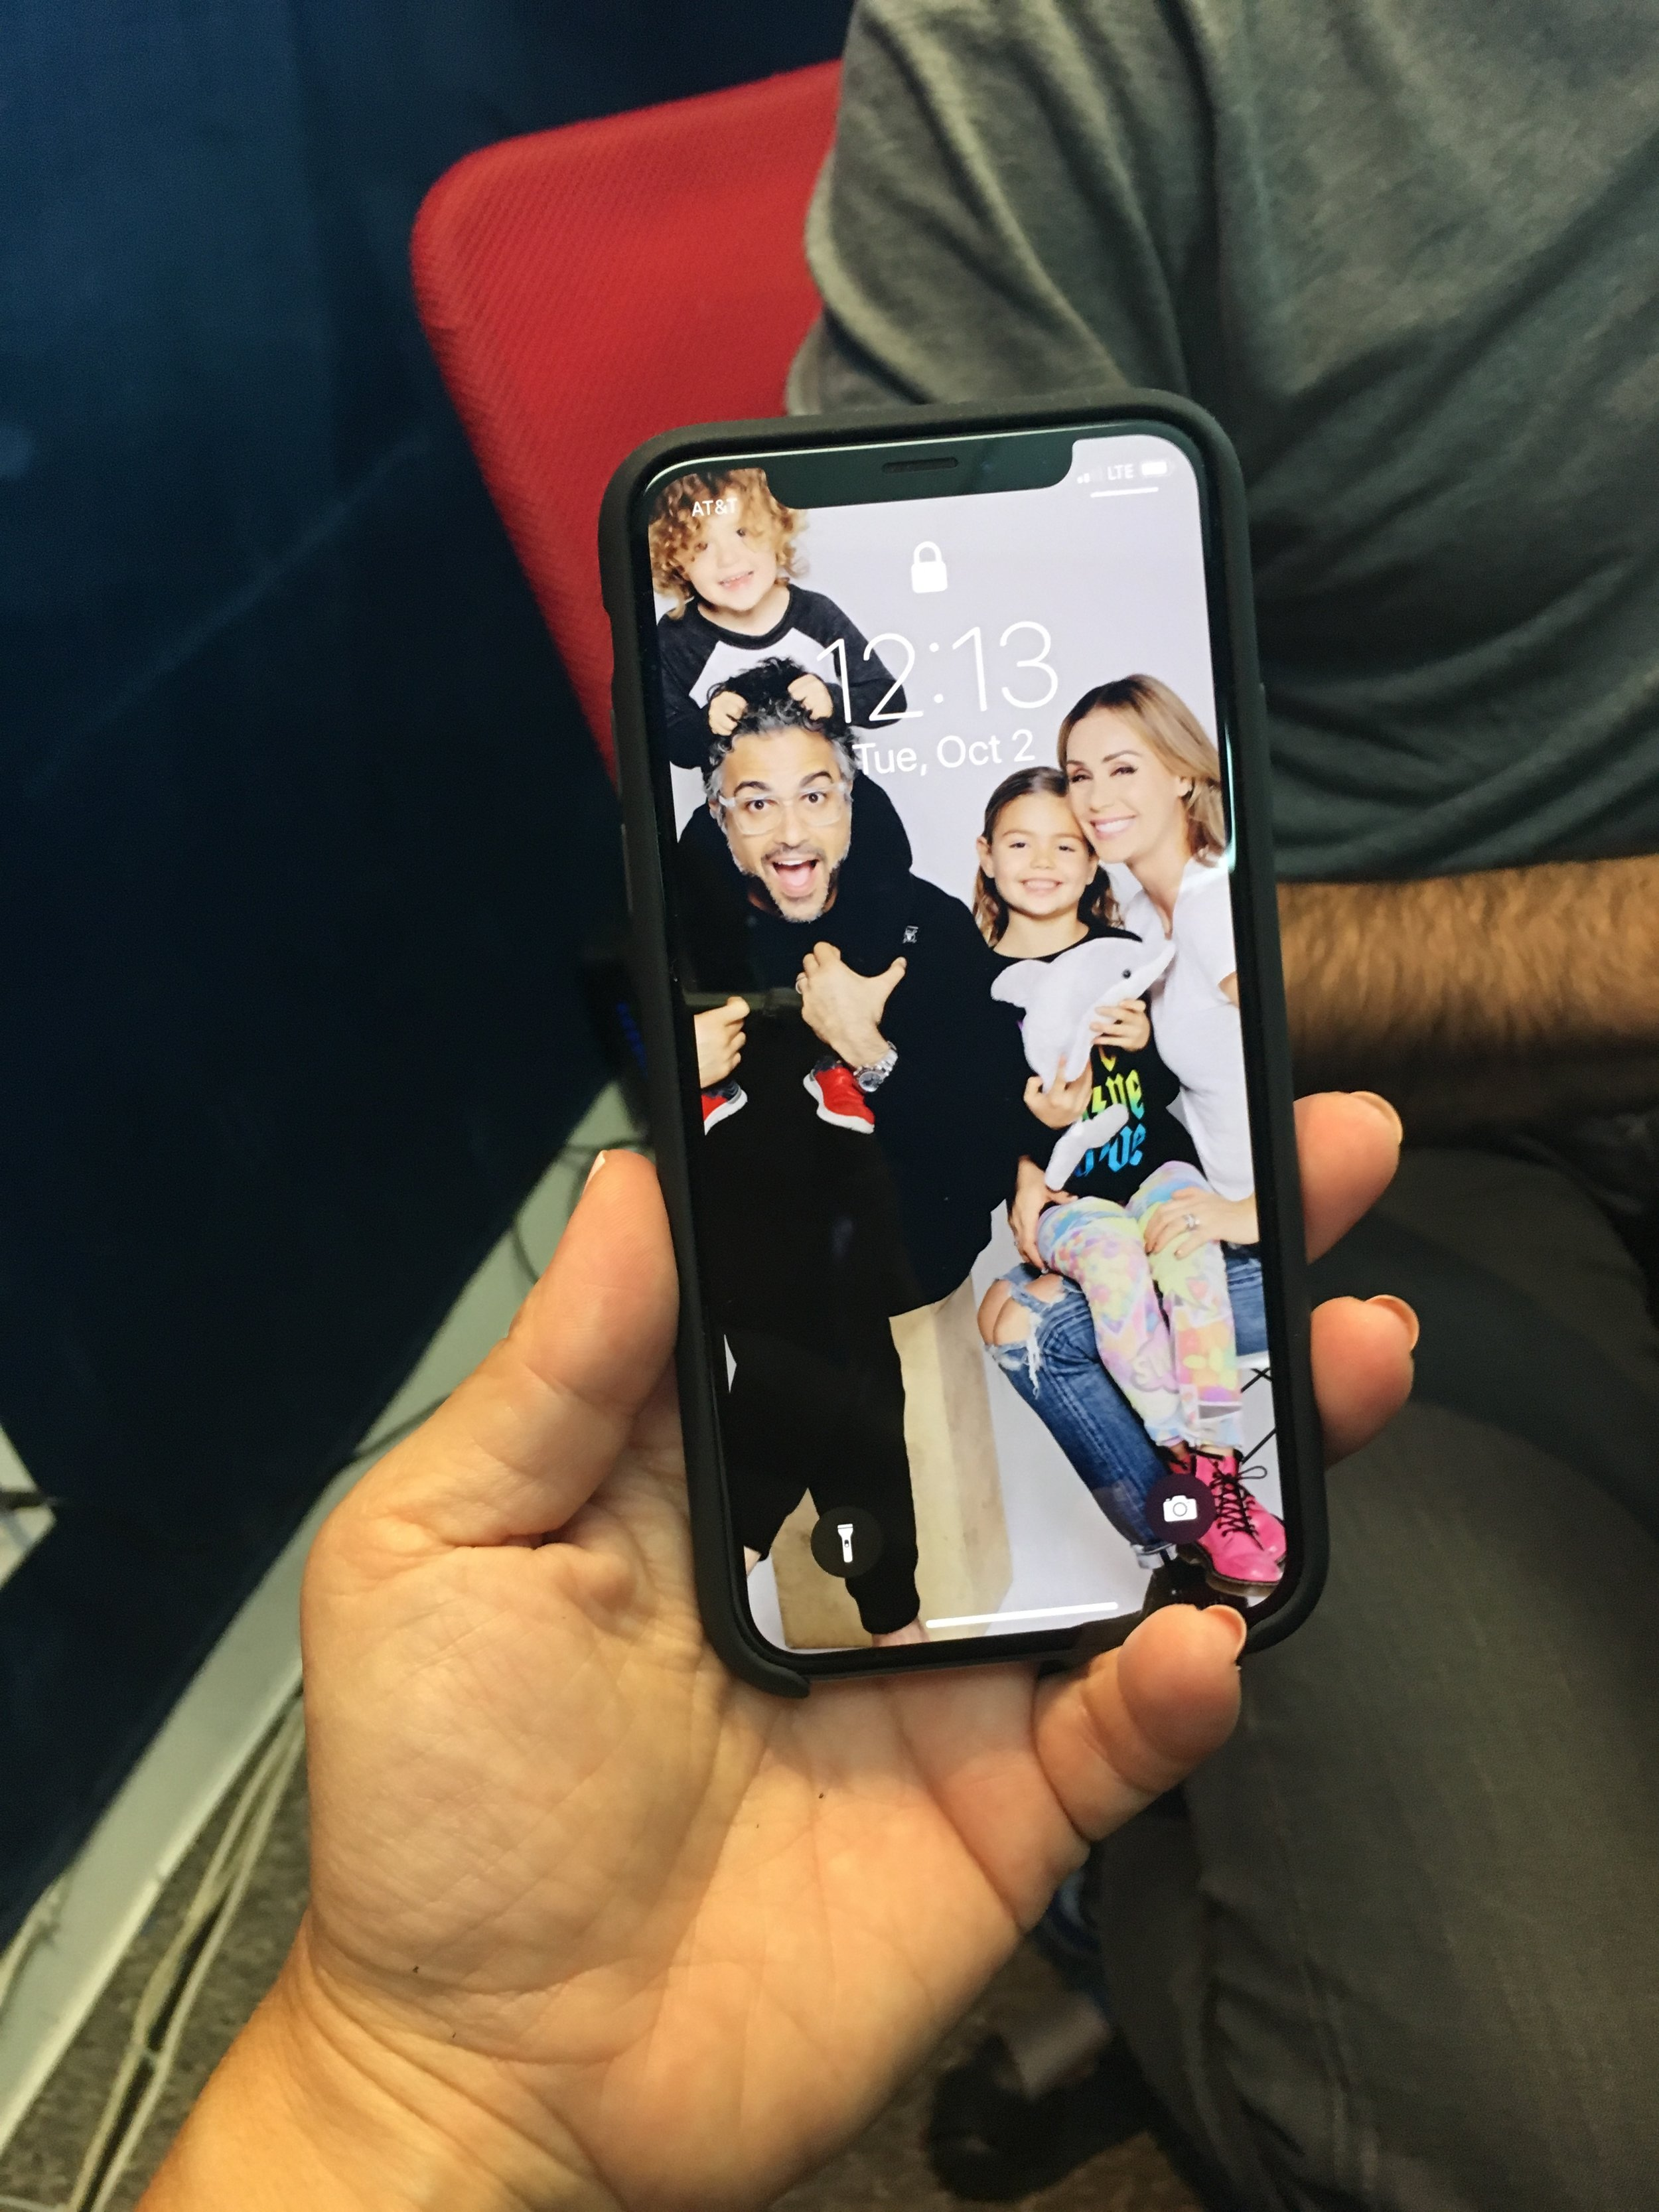 Jaime Camil's family photo on his phone